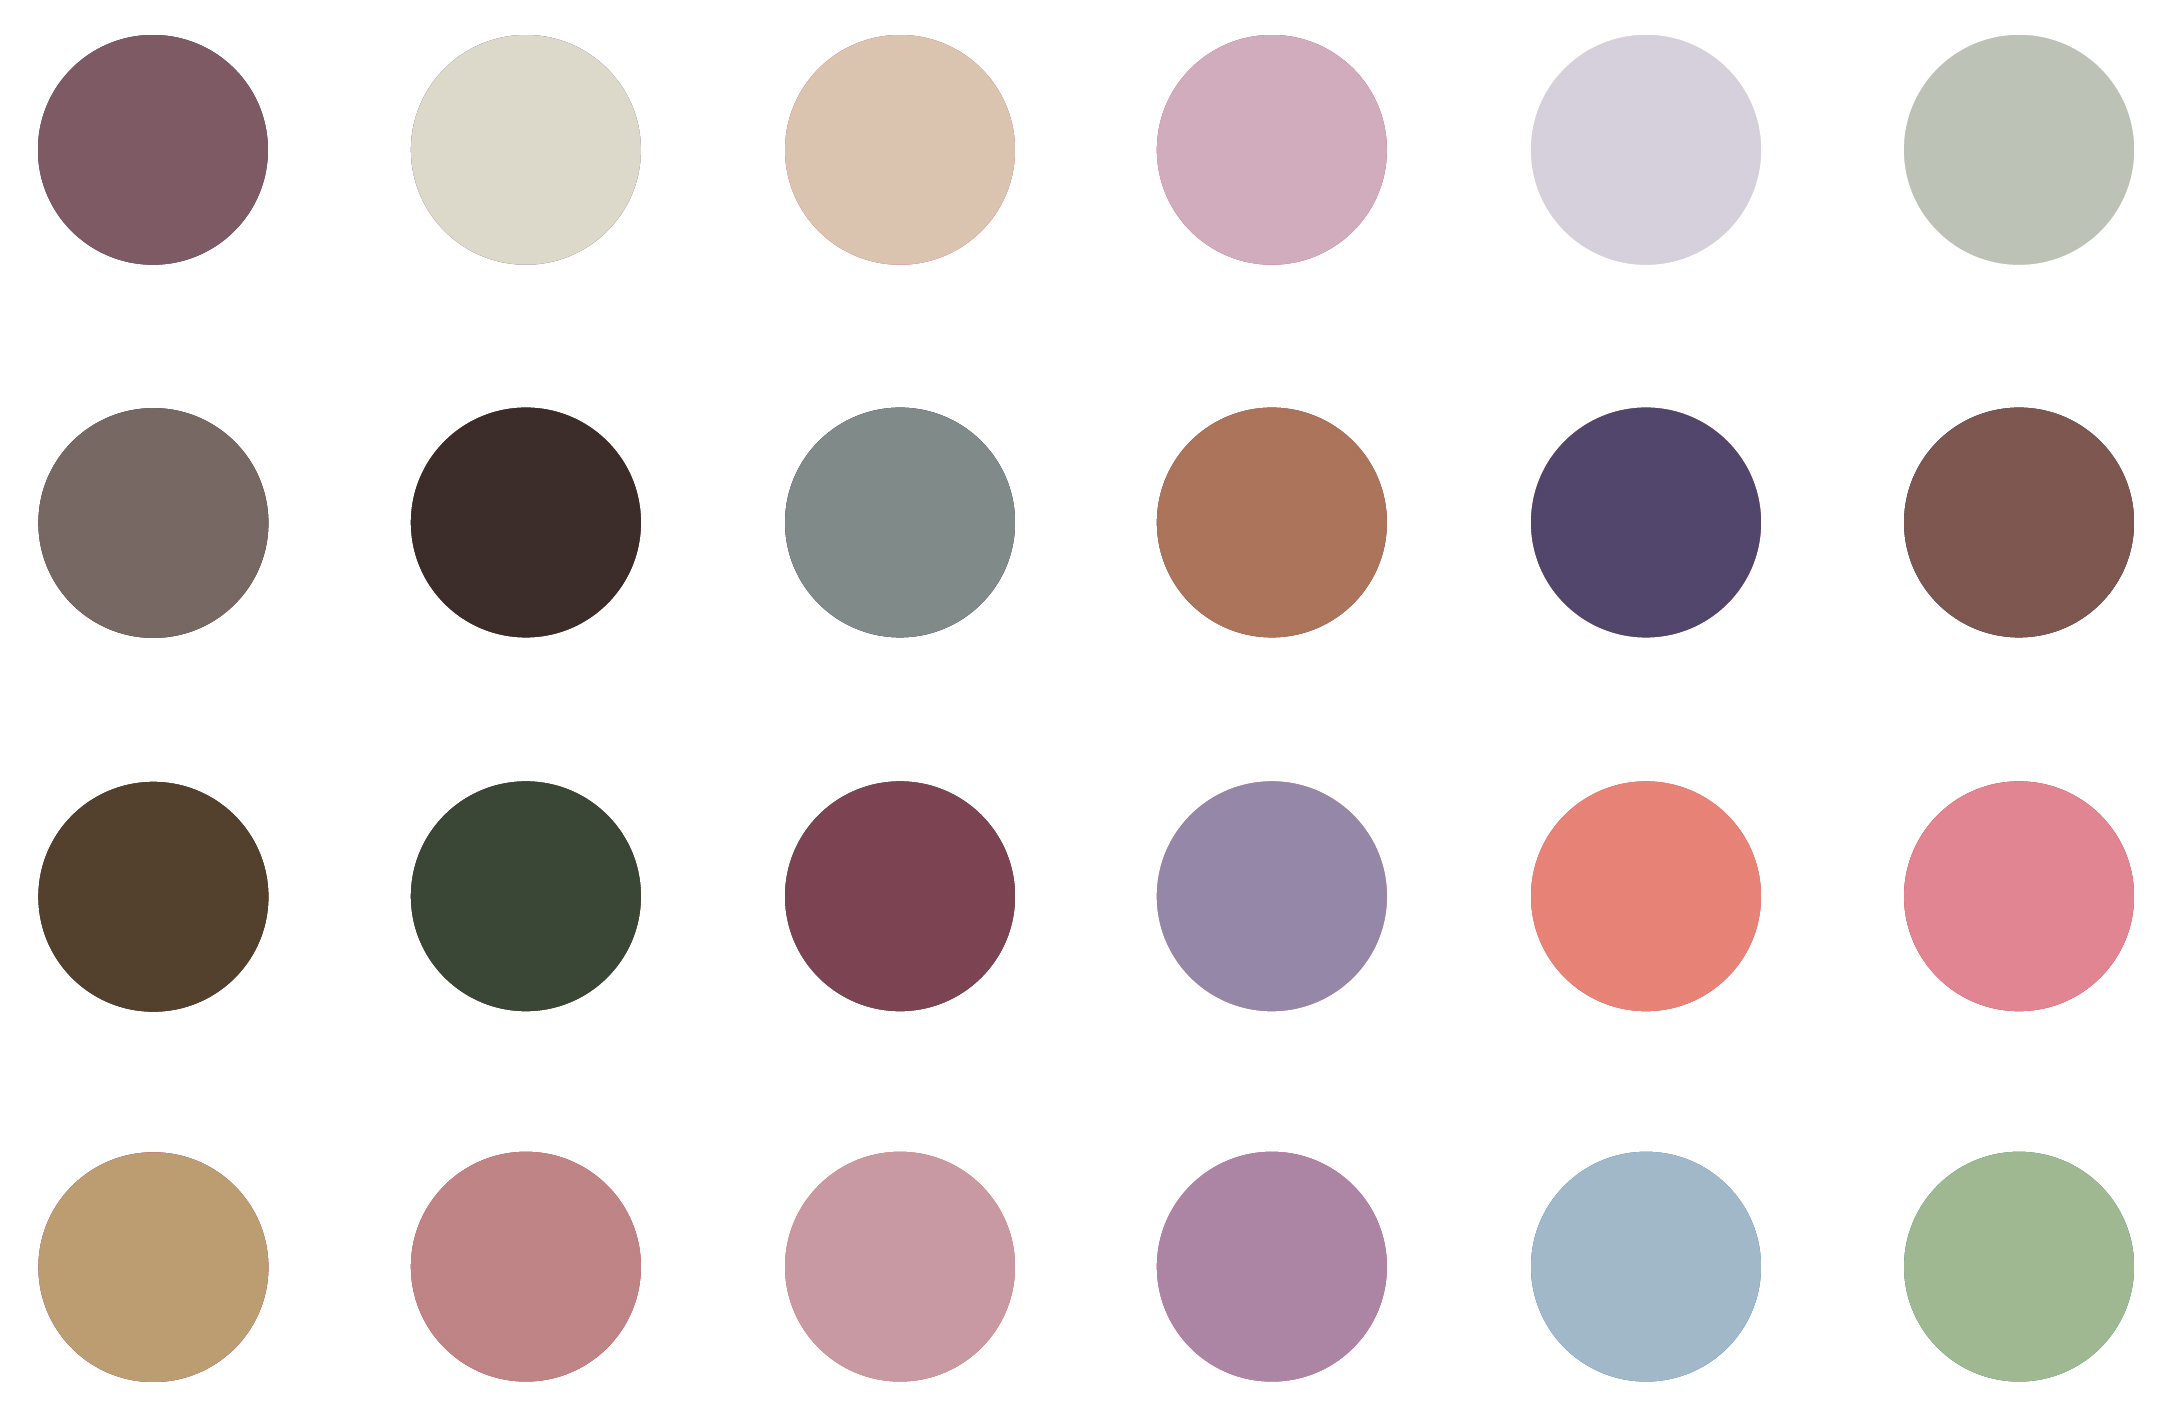 EgoStyle-Color-Illu-2.jpg